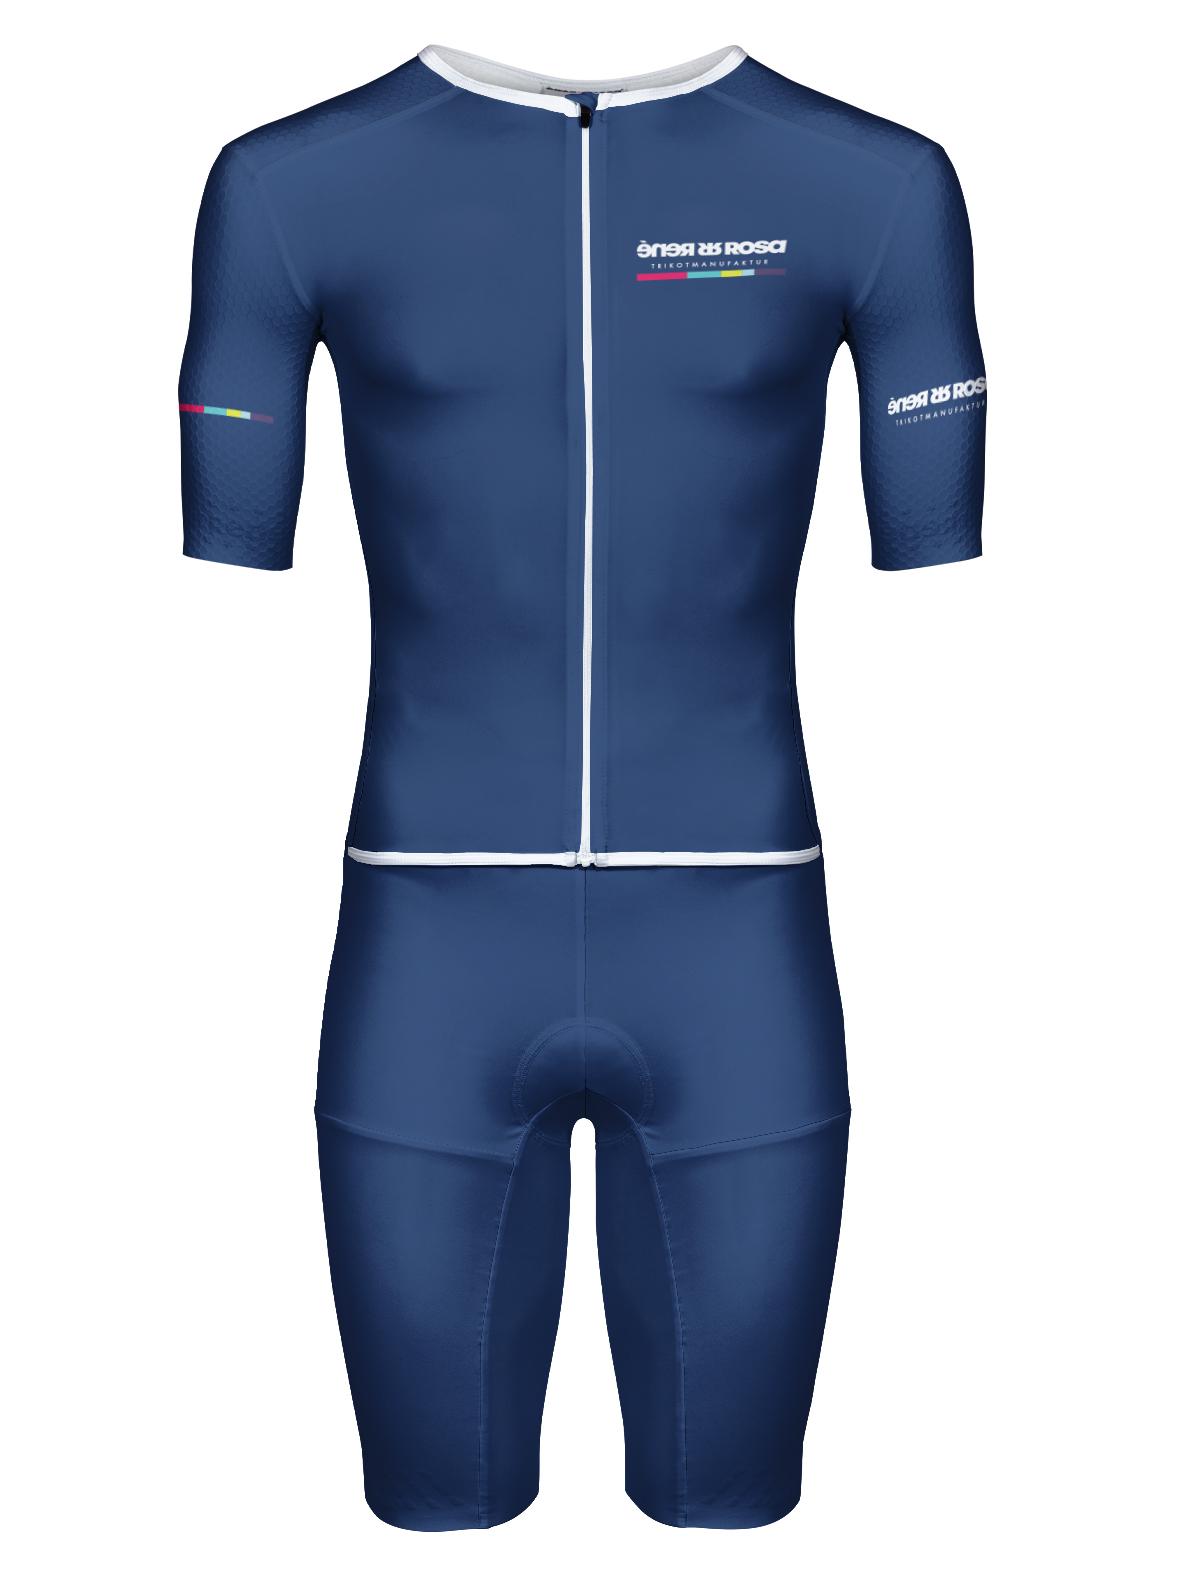 Aero Triathlon Einteiler  RRT2777M Herren Longversion / RR-Stripes blau